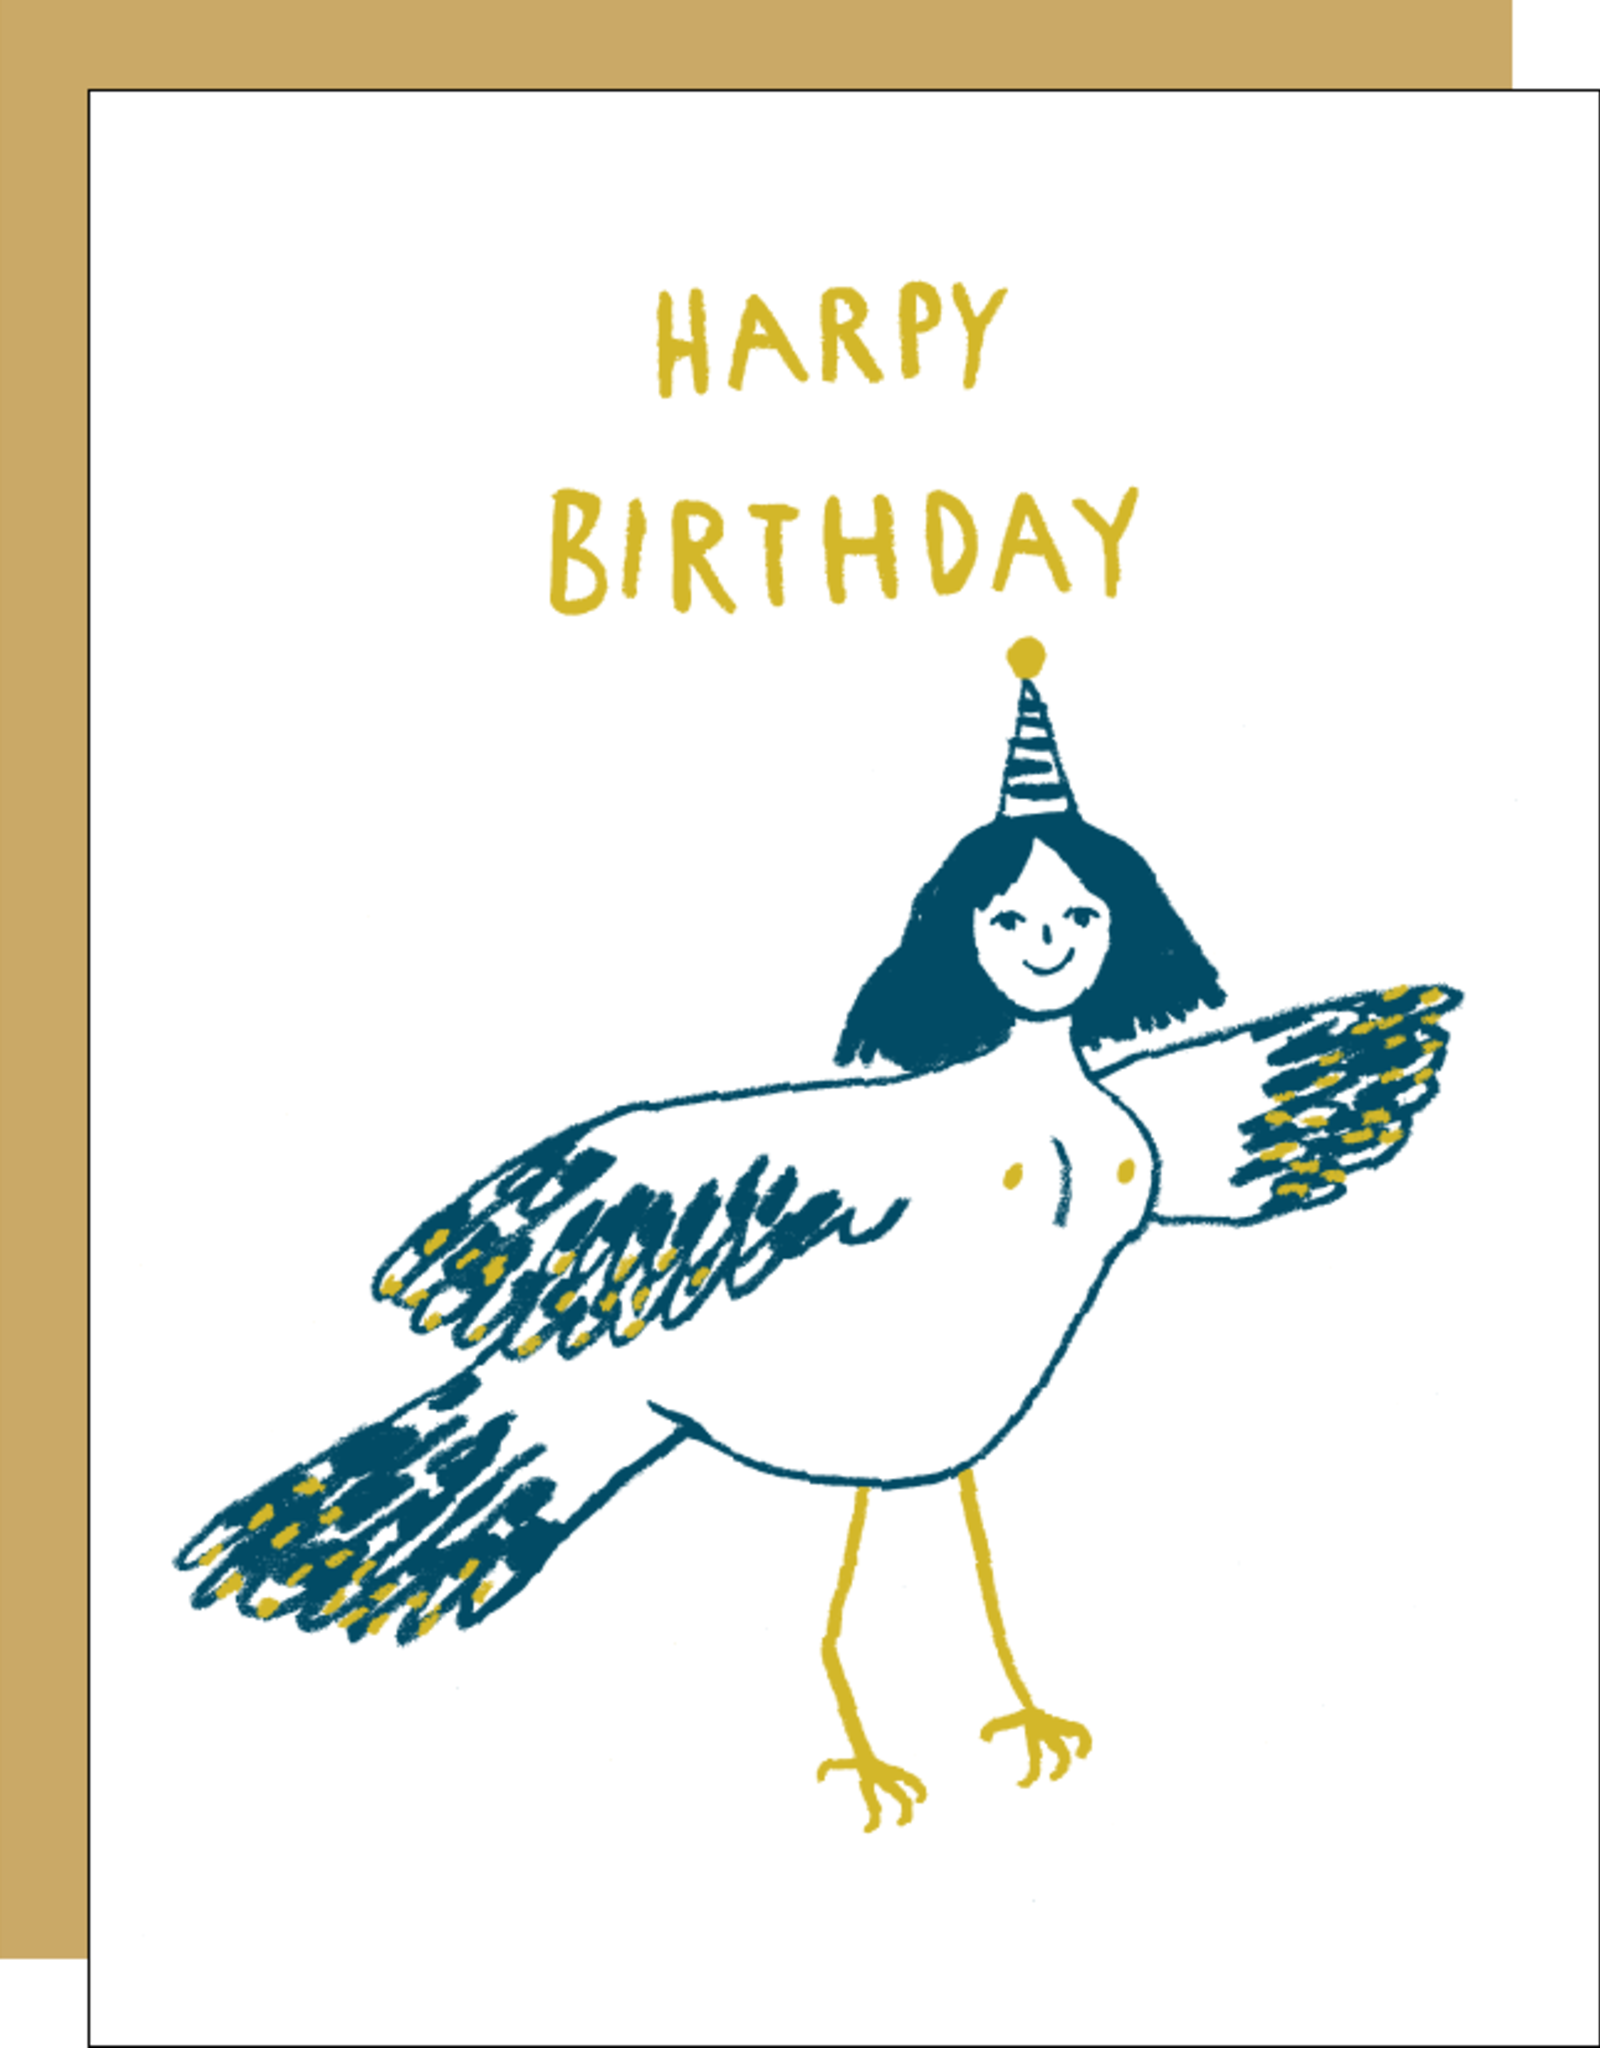 Egg Press Manufacturing Card - Birthday: Harpy Birthday